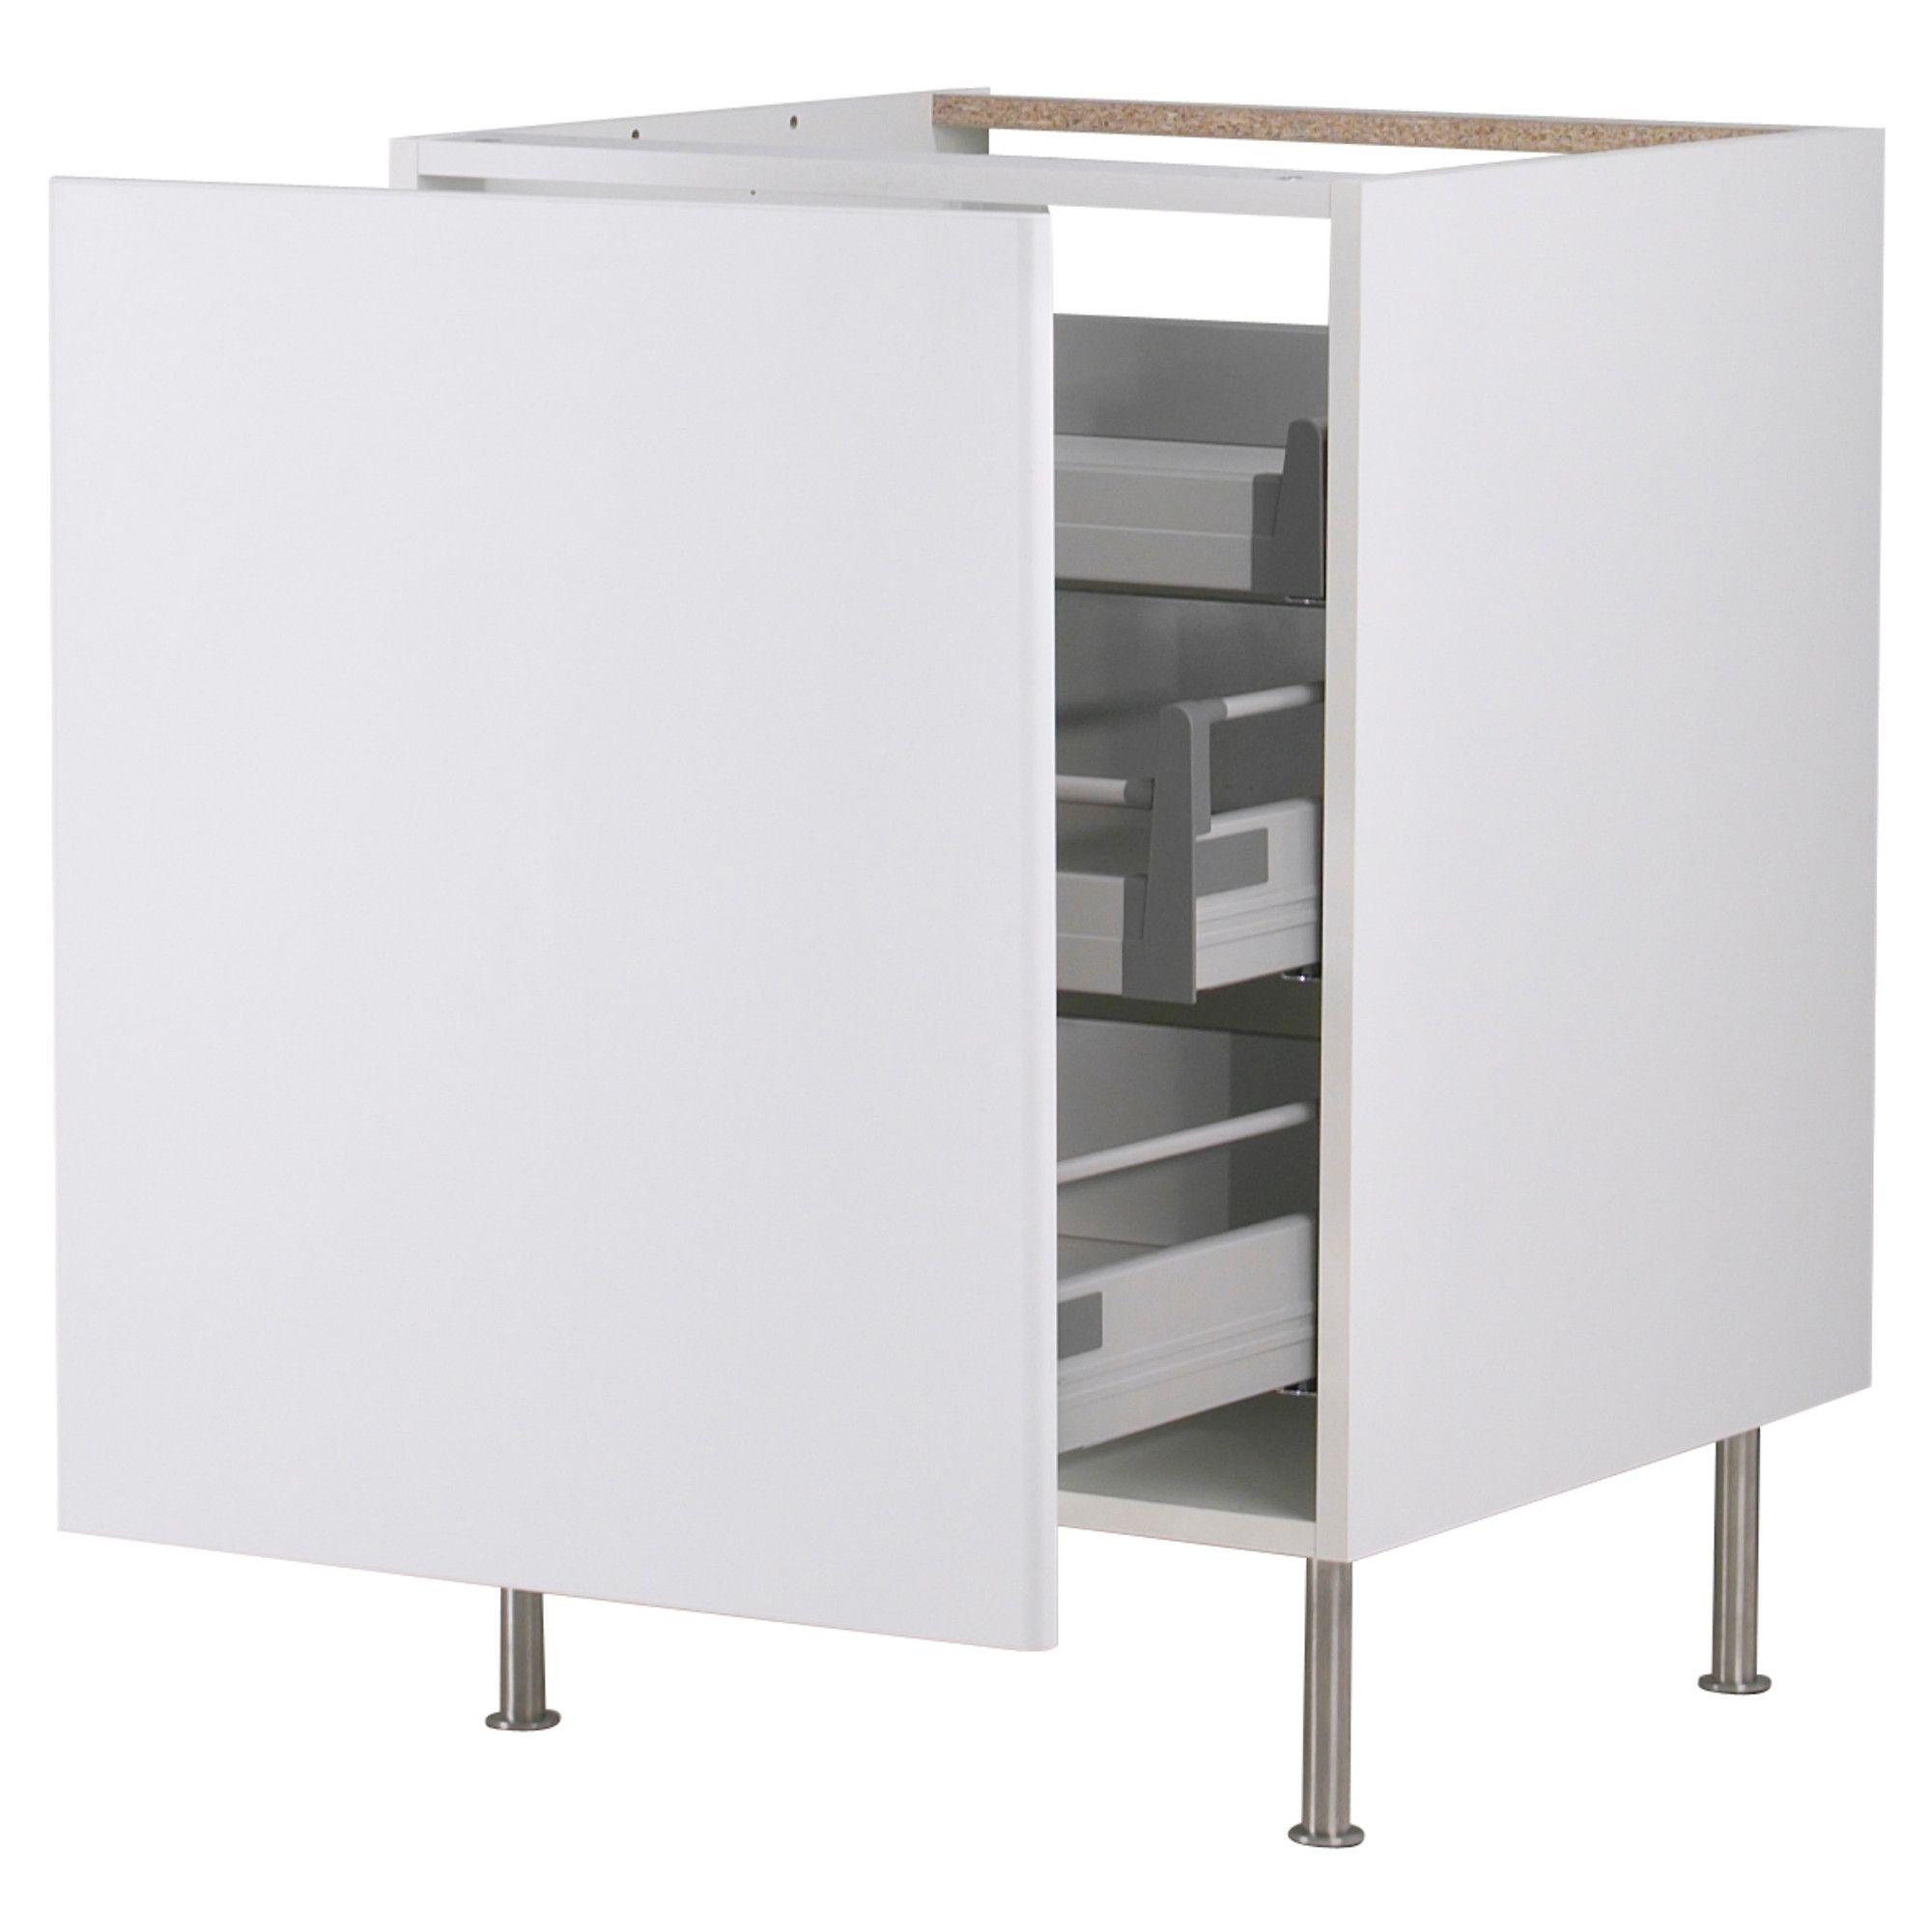 Ikea Nederland Interieur Online Bestellen Onder Kast Ikea Opslag